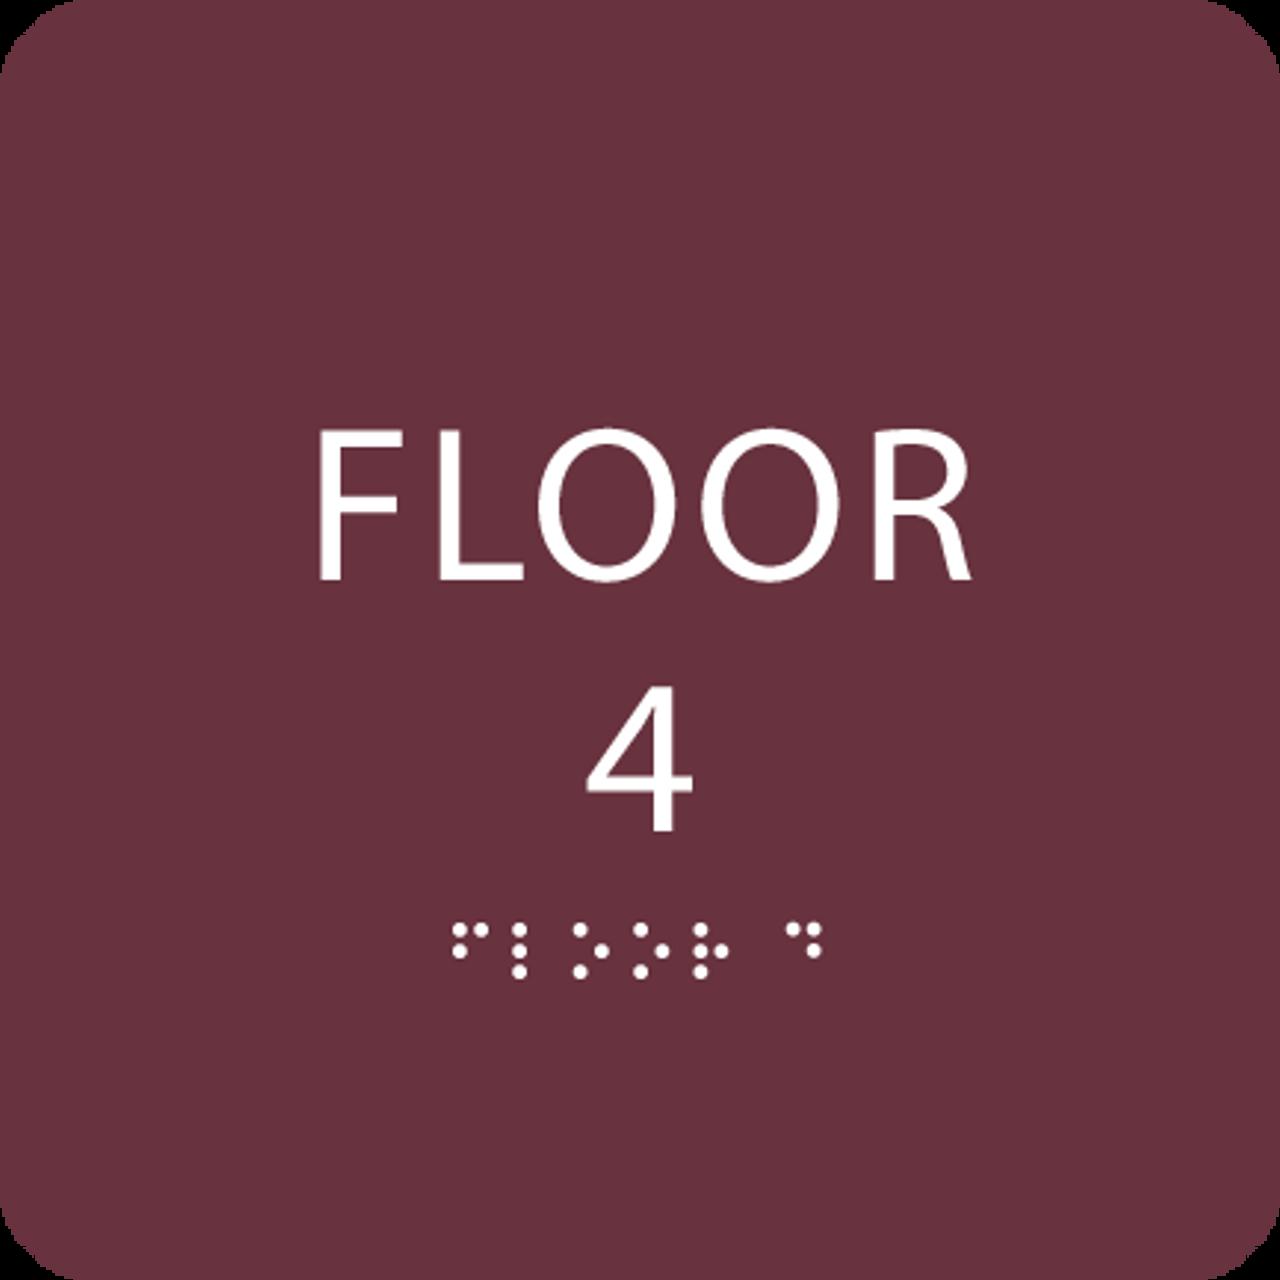 Burgundy Floor 4 Identification Sign